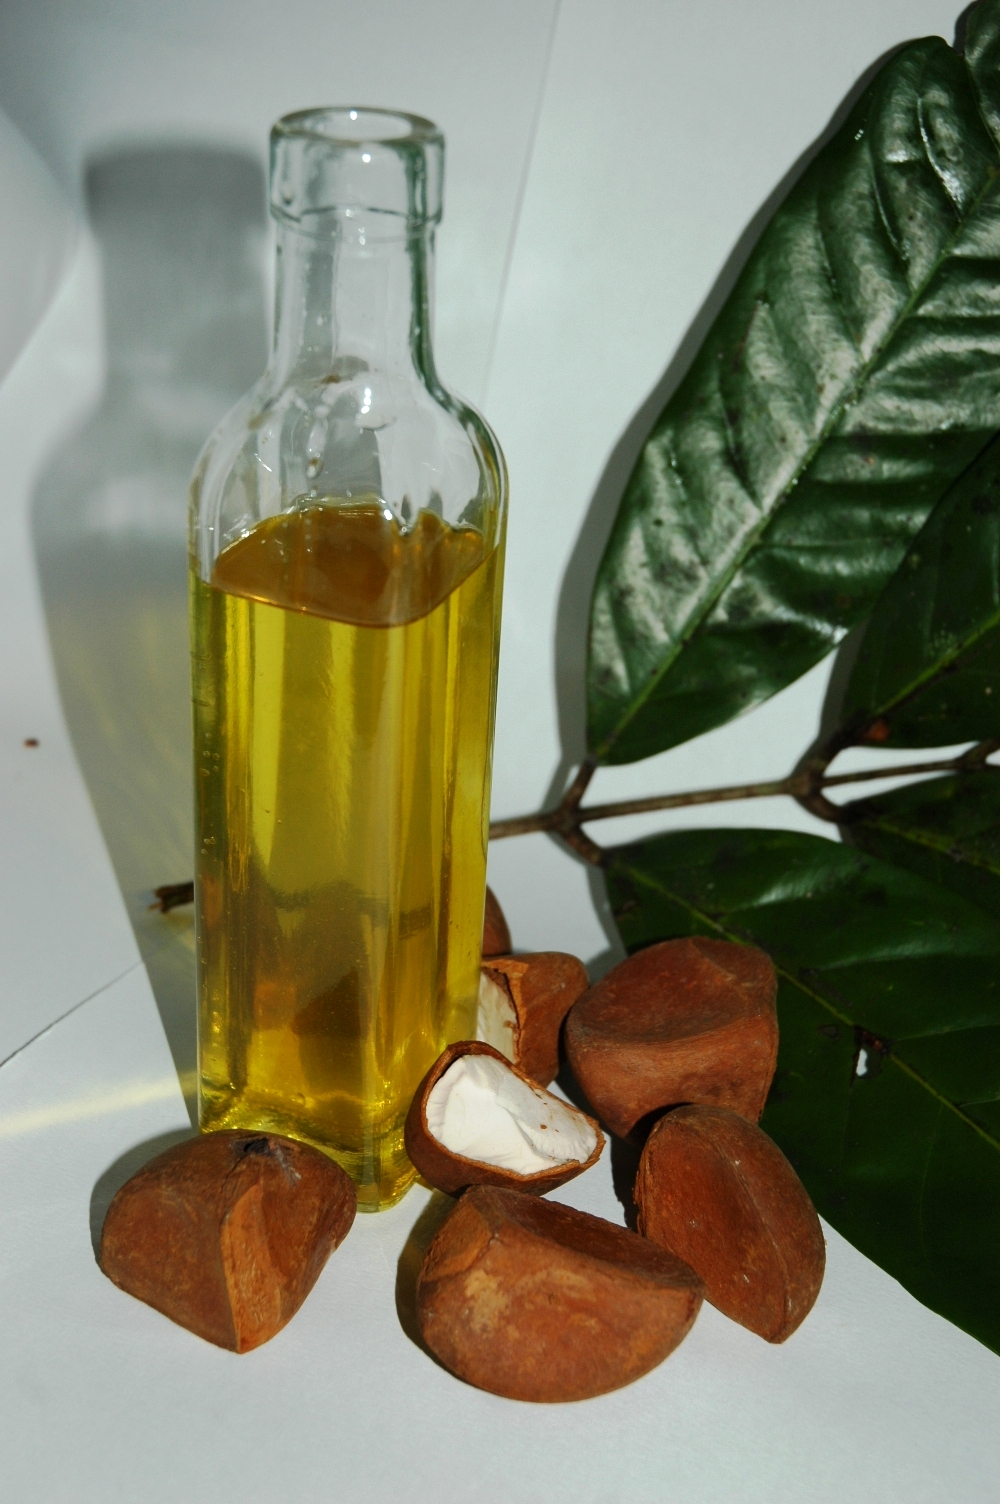 File:Crabwood oil or Andiroba oil.JPG - Wikimedia Commons